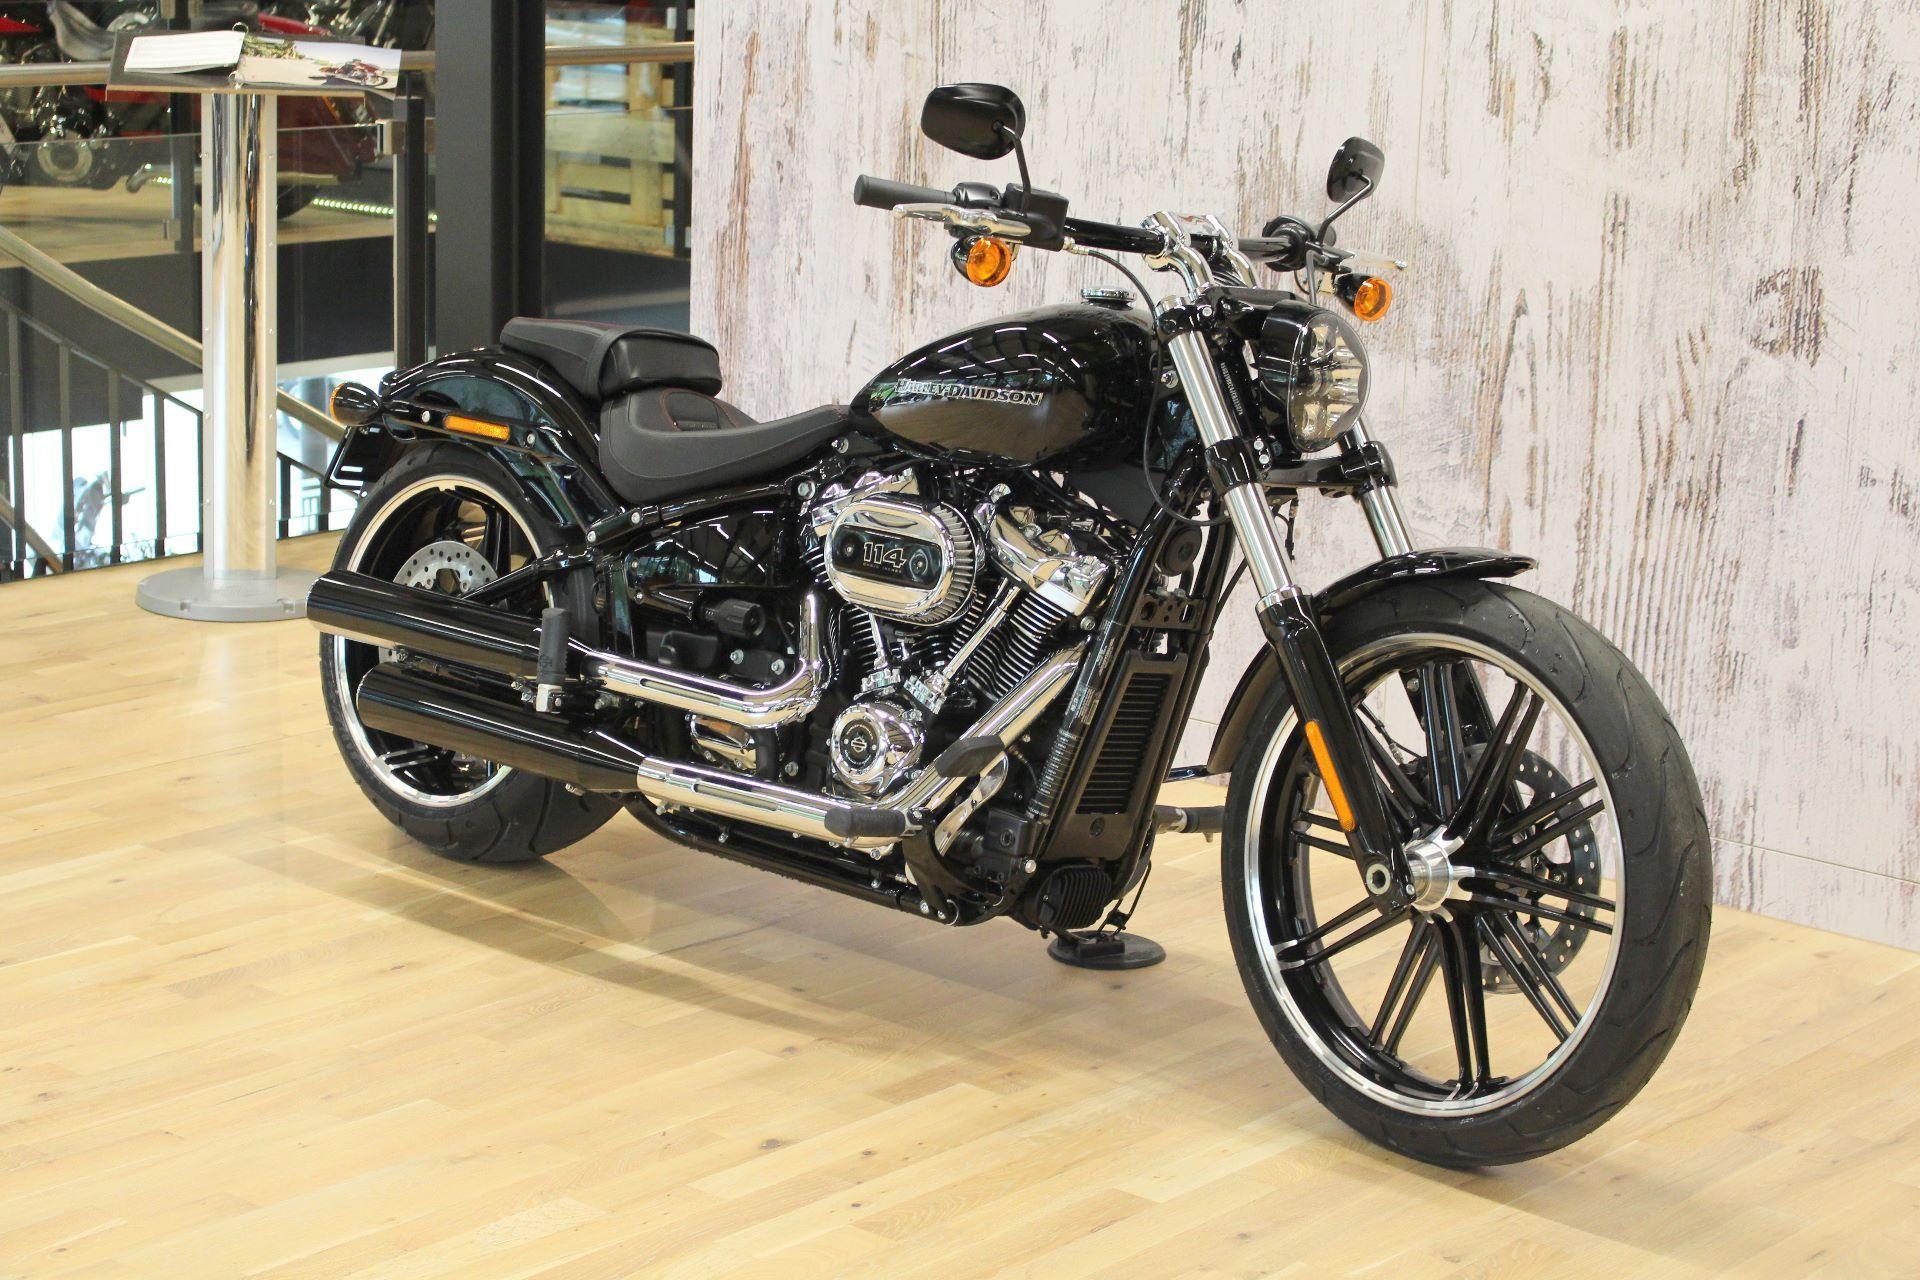 HARLEY-DAVIDSON FXBRS 1868 BREAKOUT 114 Model 2018 Harley